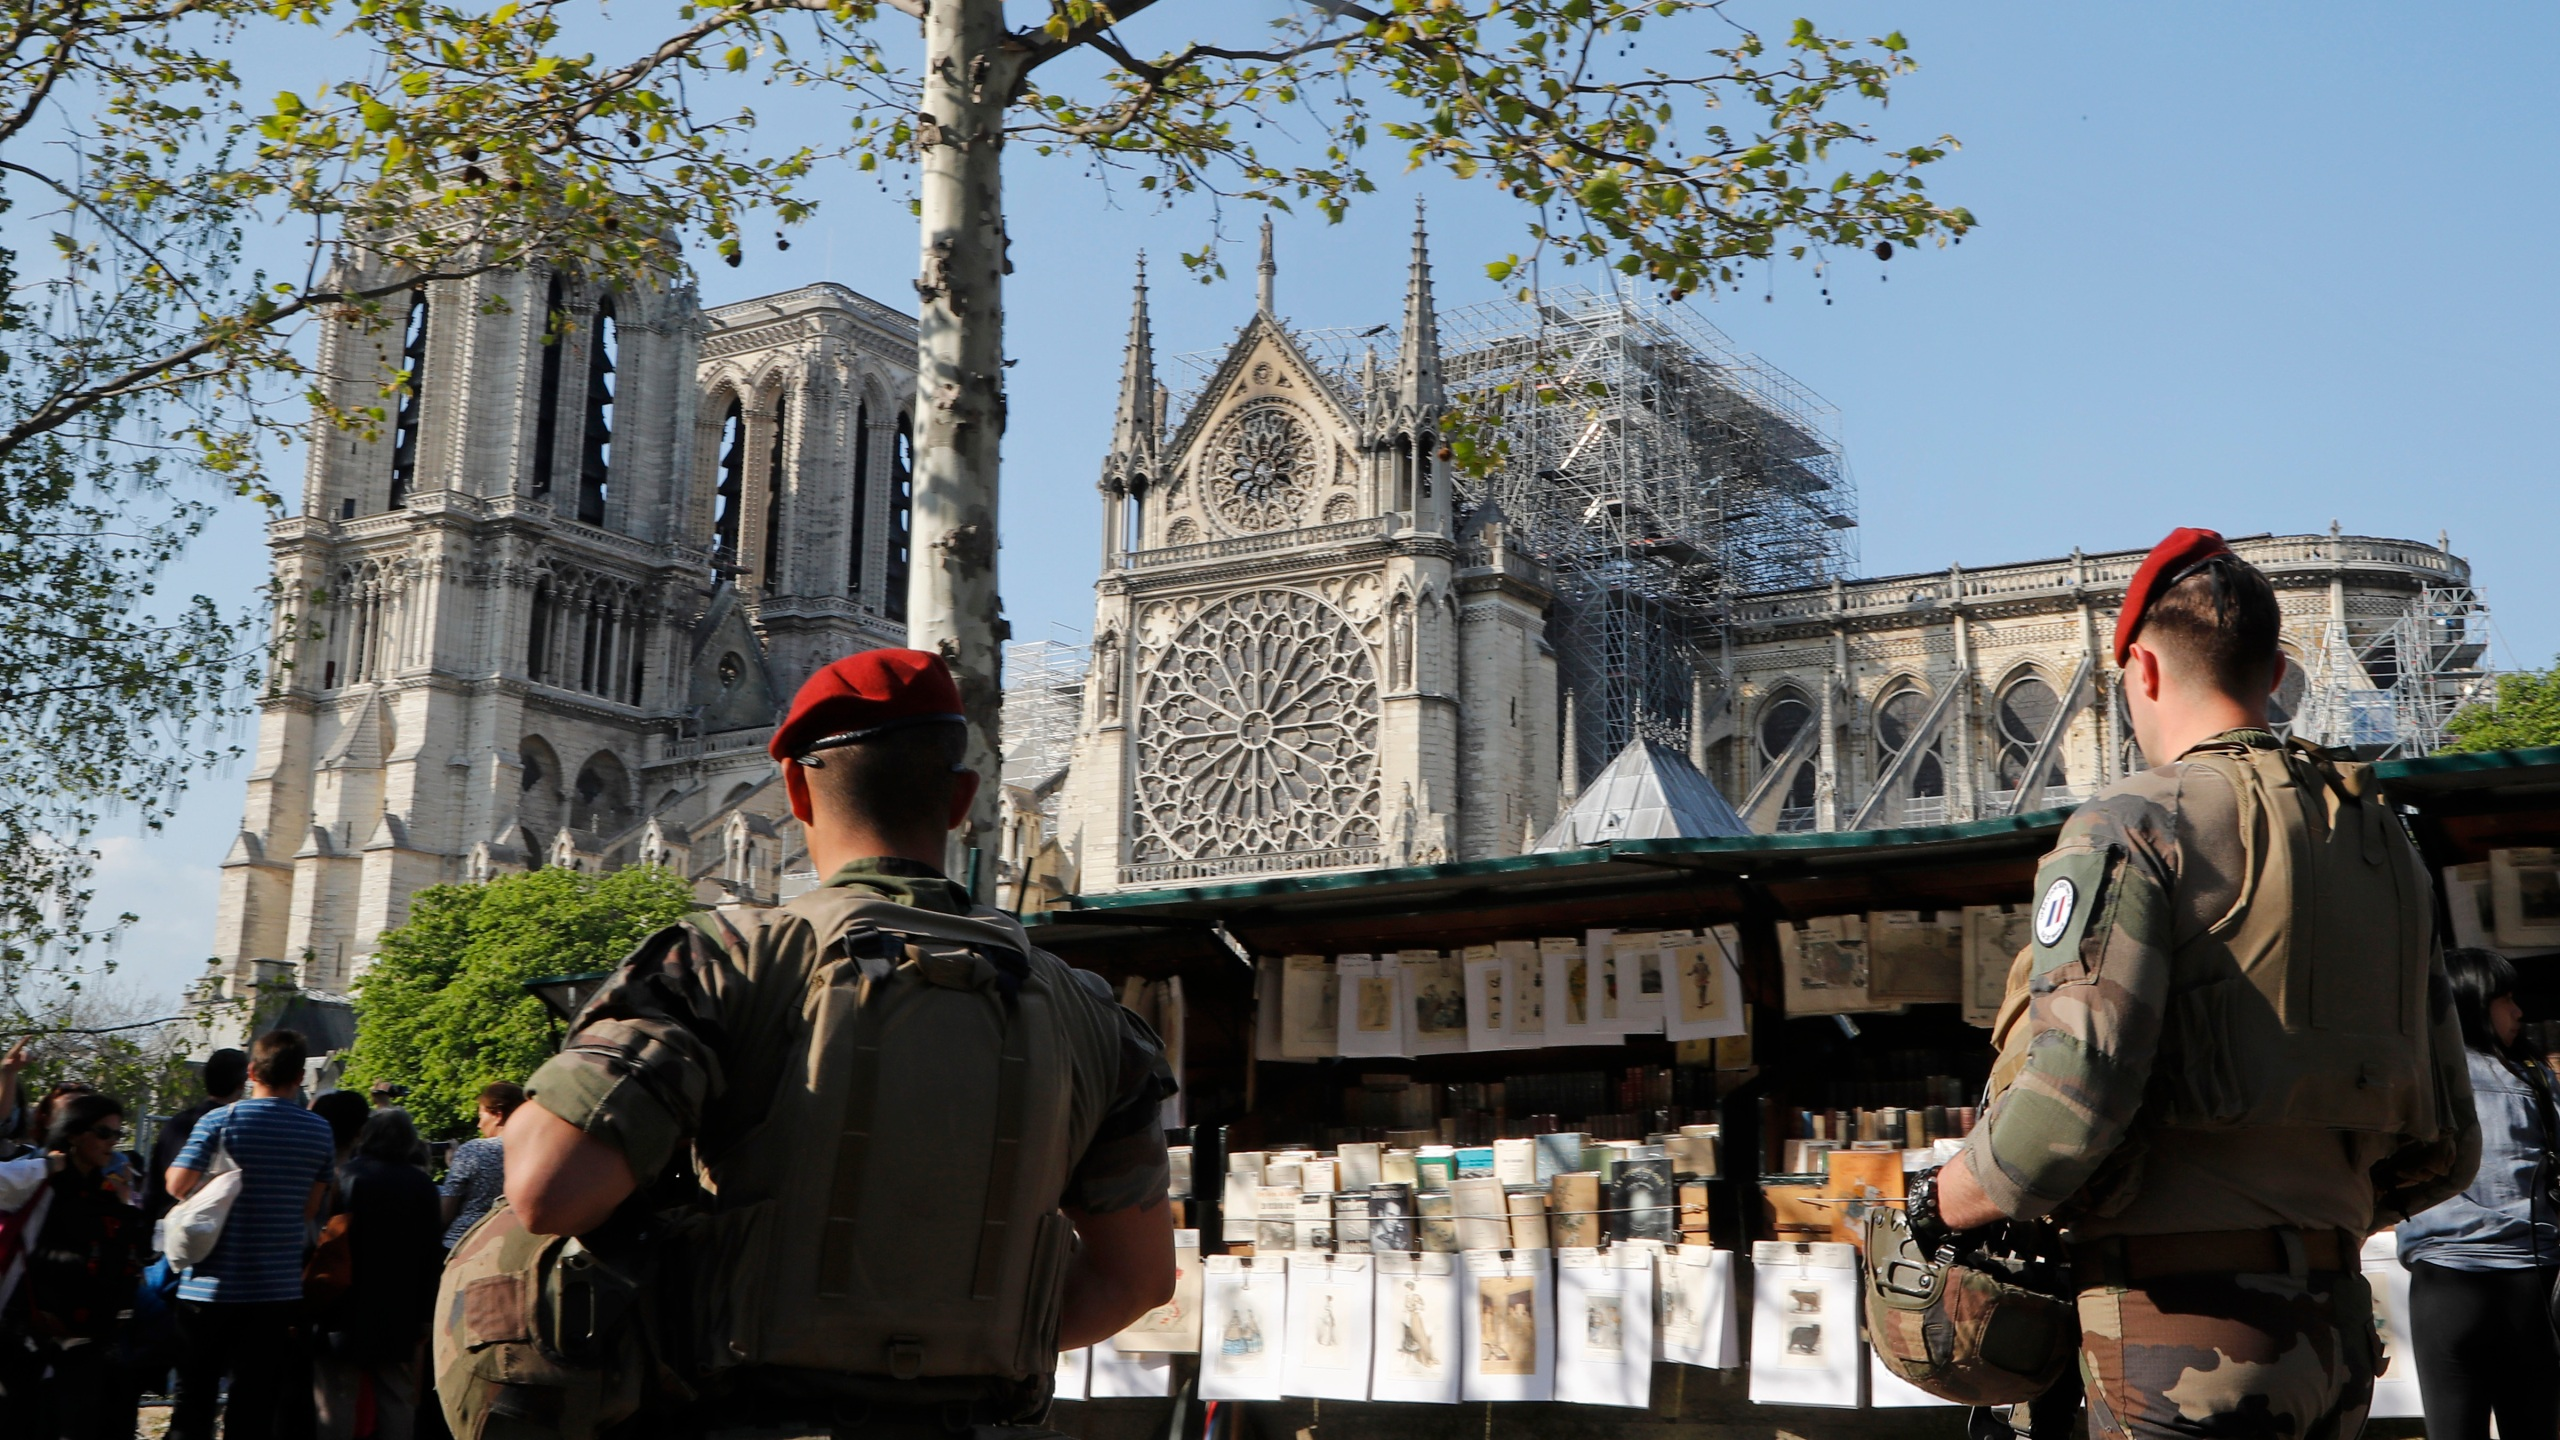 France_Notre_Dame_Fire_82618-159532.jpg74208218